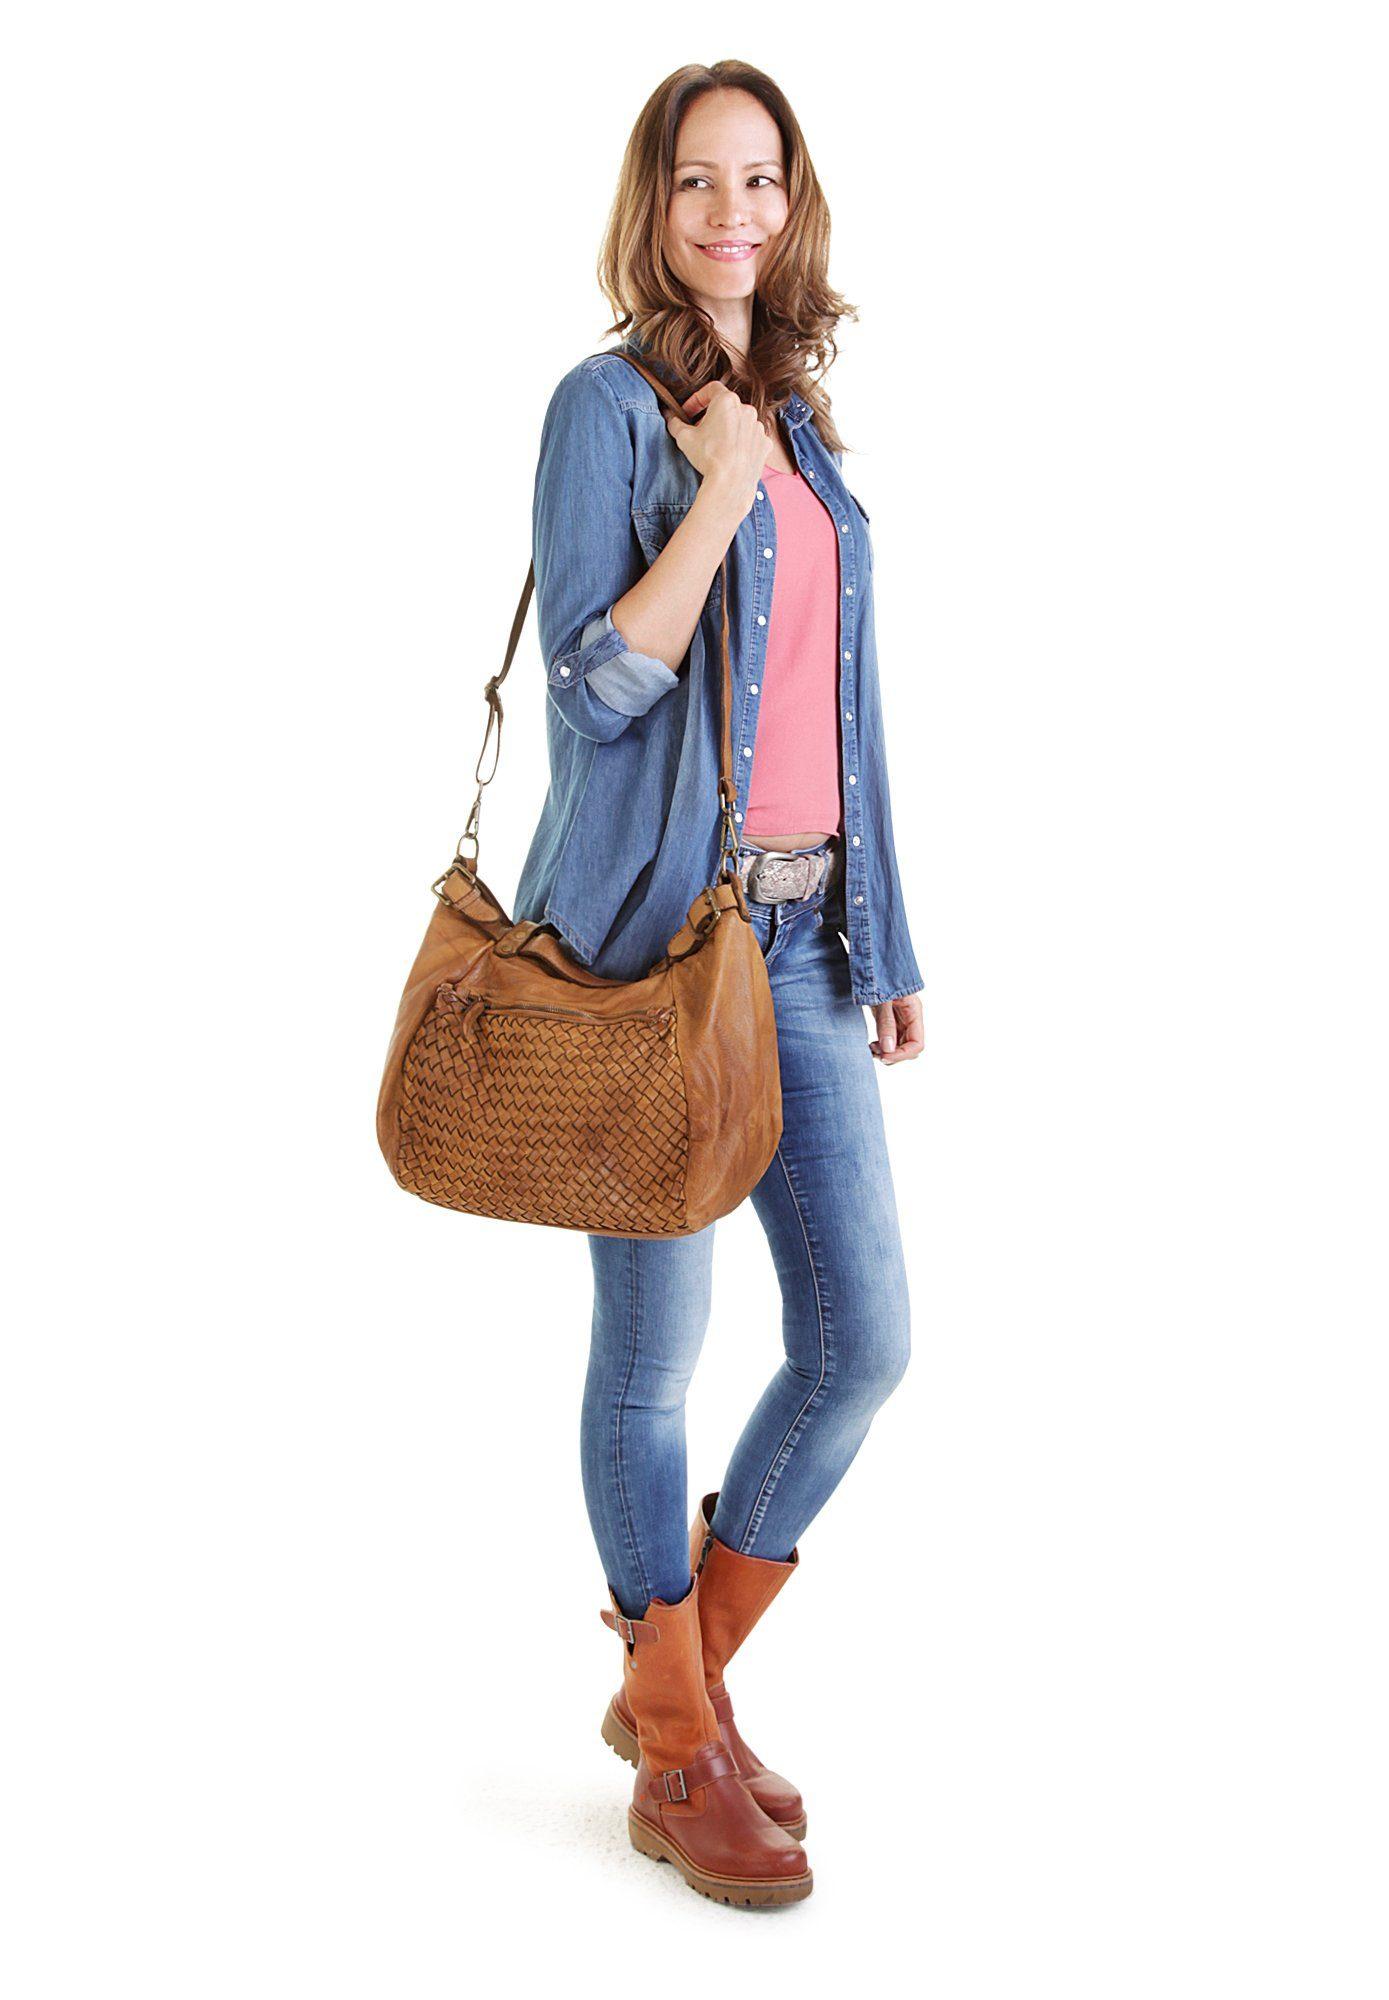 Je Look Vind Samantha Bij Shopper bgyvY6f7